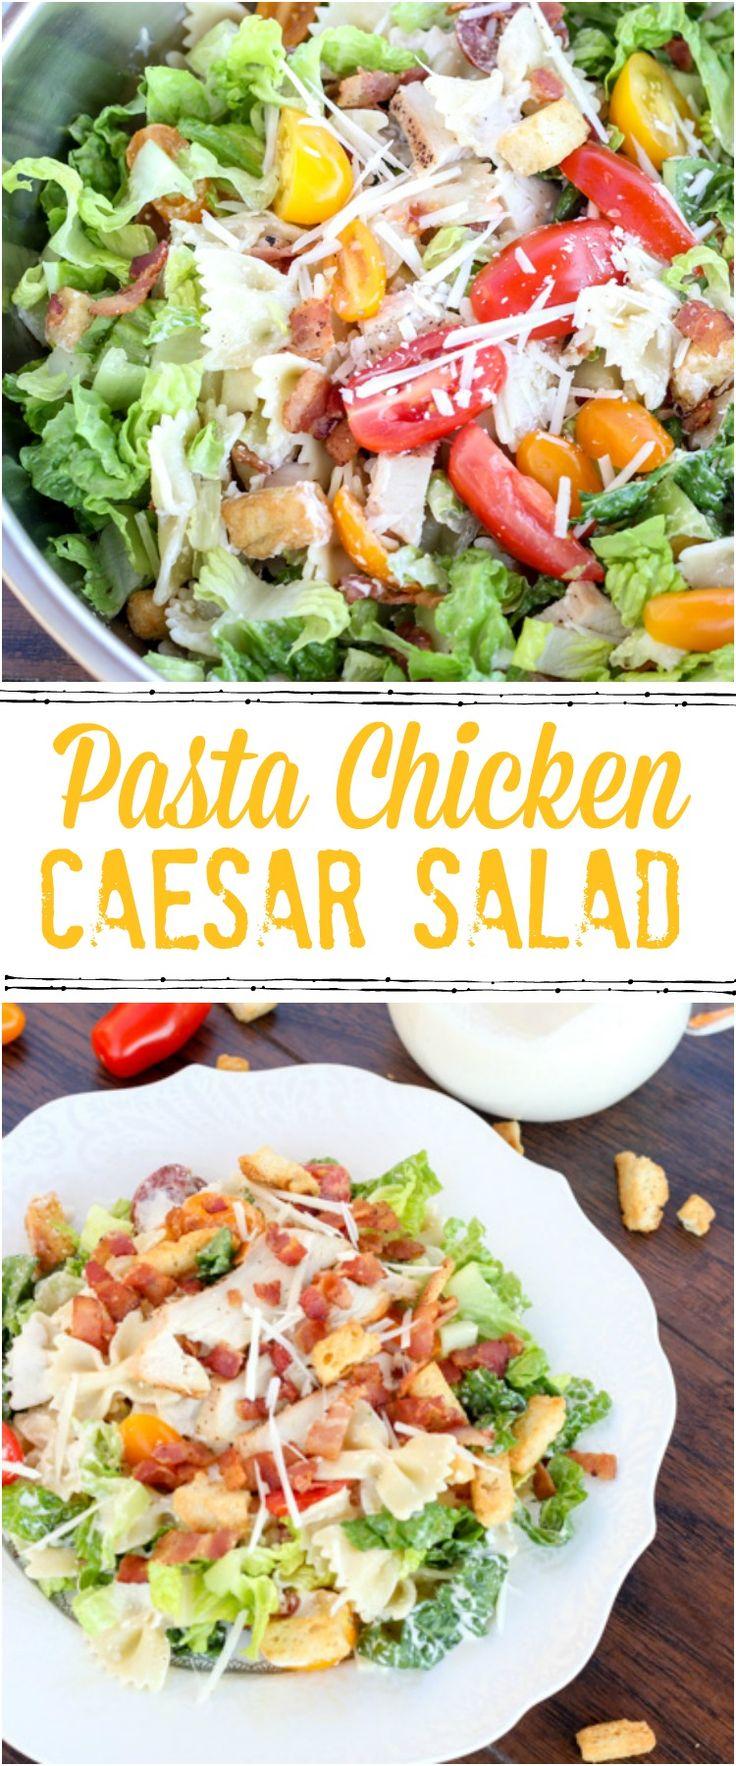 Pasta chicken Caesar recipe